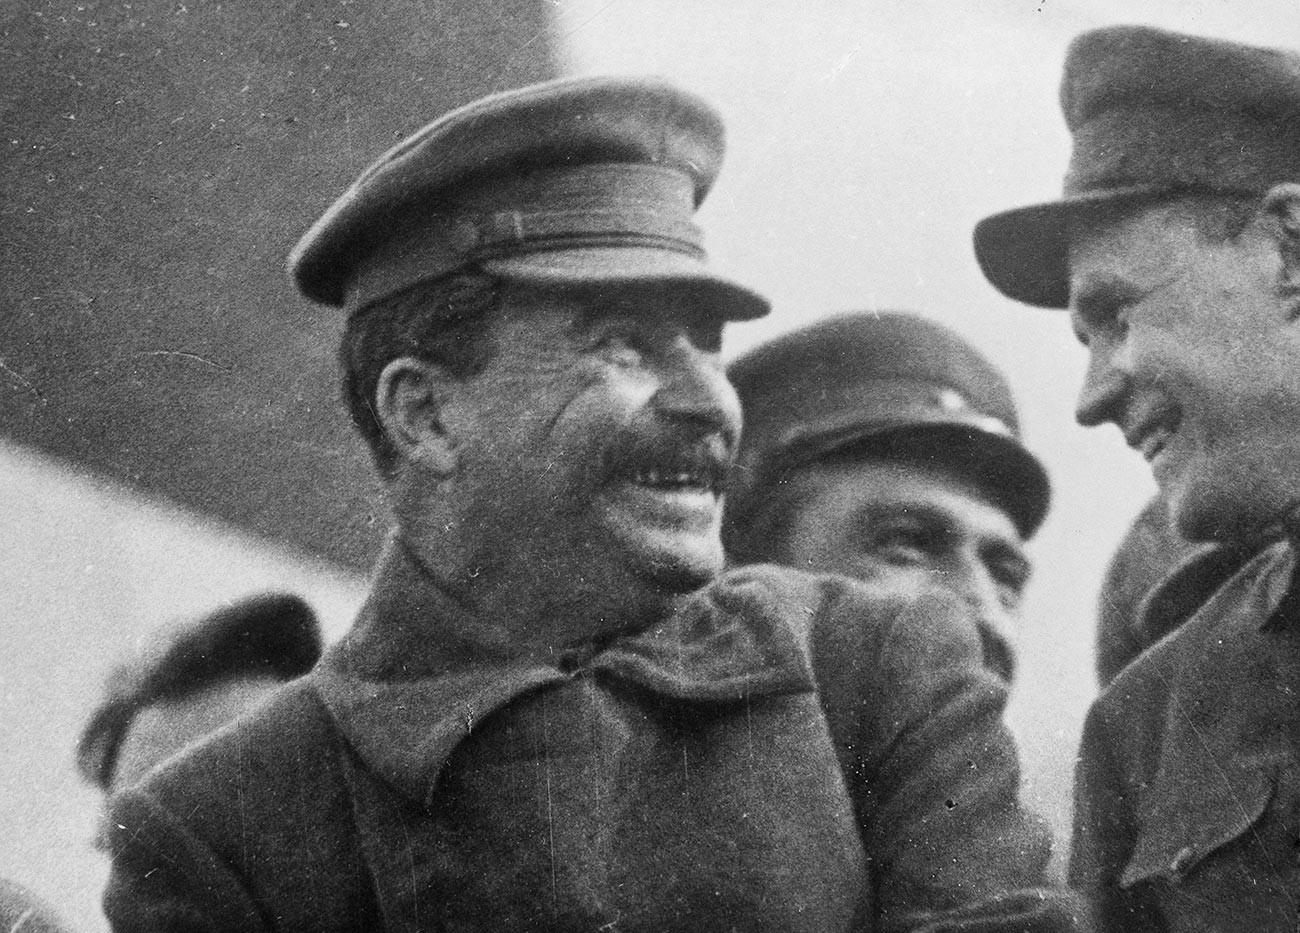 Stalin riéndose en la cima del Mausoleo de Lenin